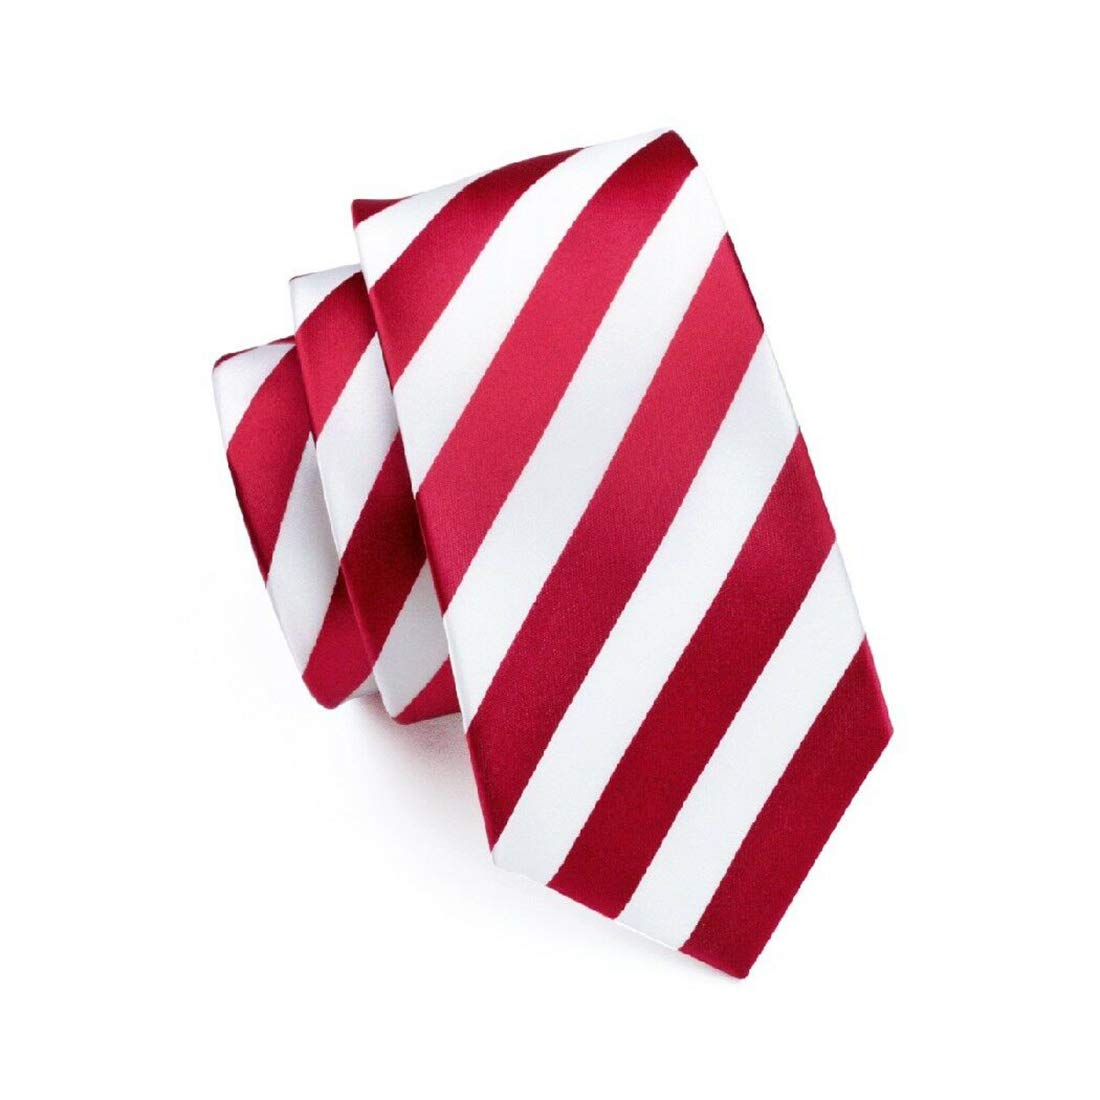 Irvint & Co 242 - Corbata de seda para hombre, diseño de rayas ...